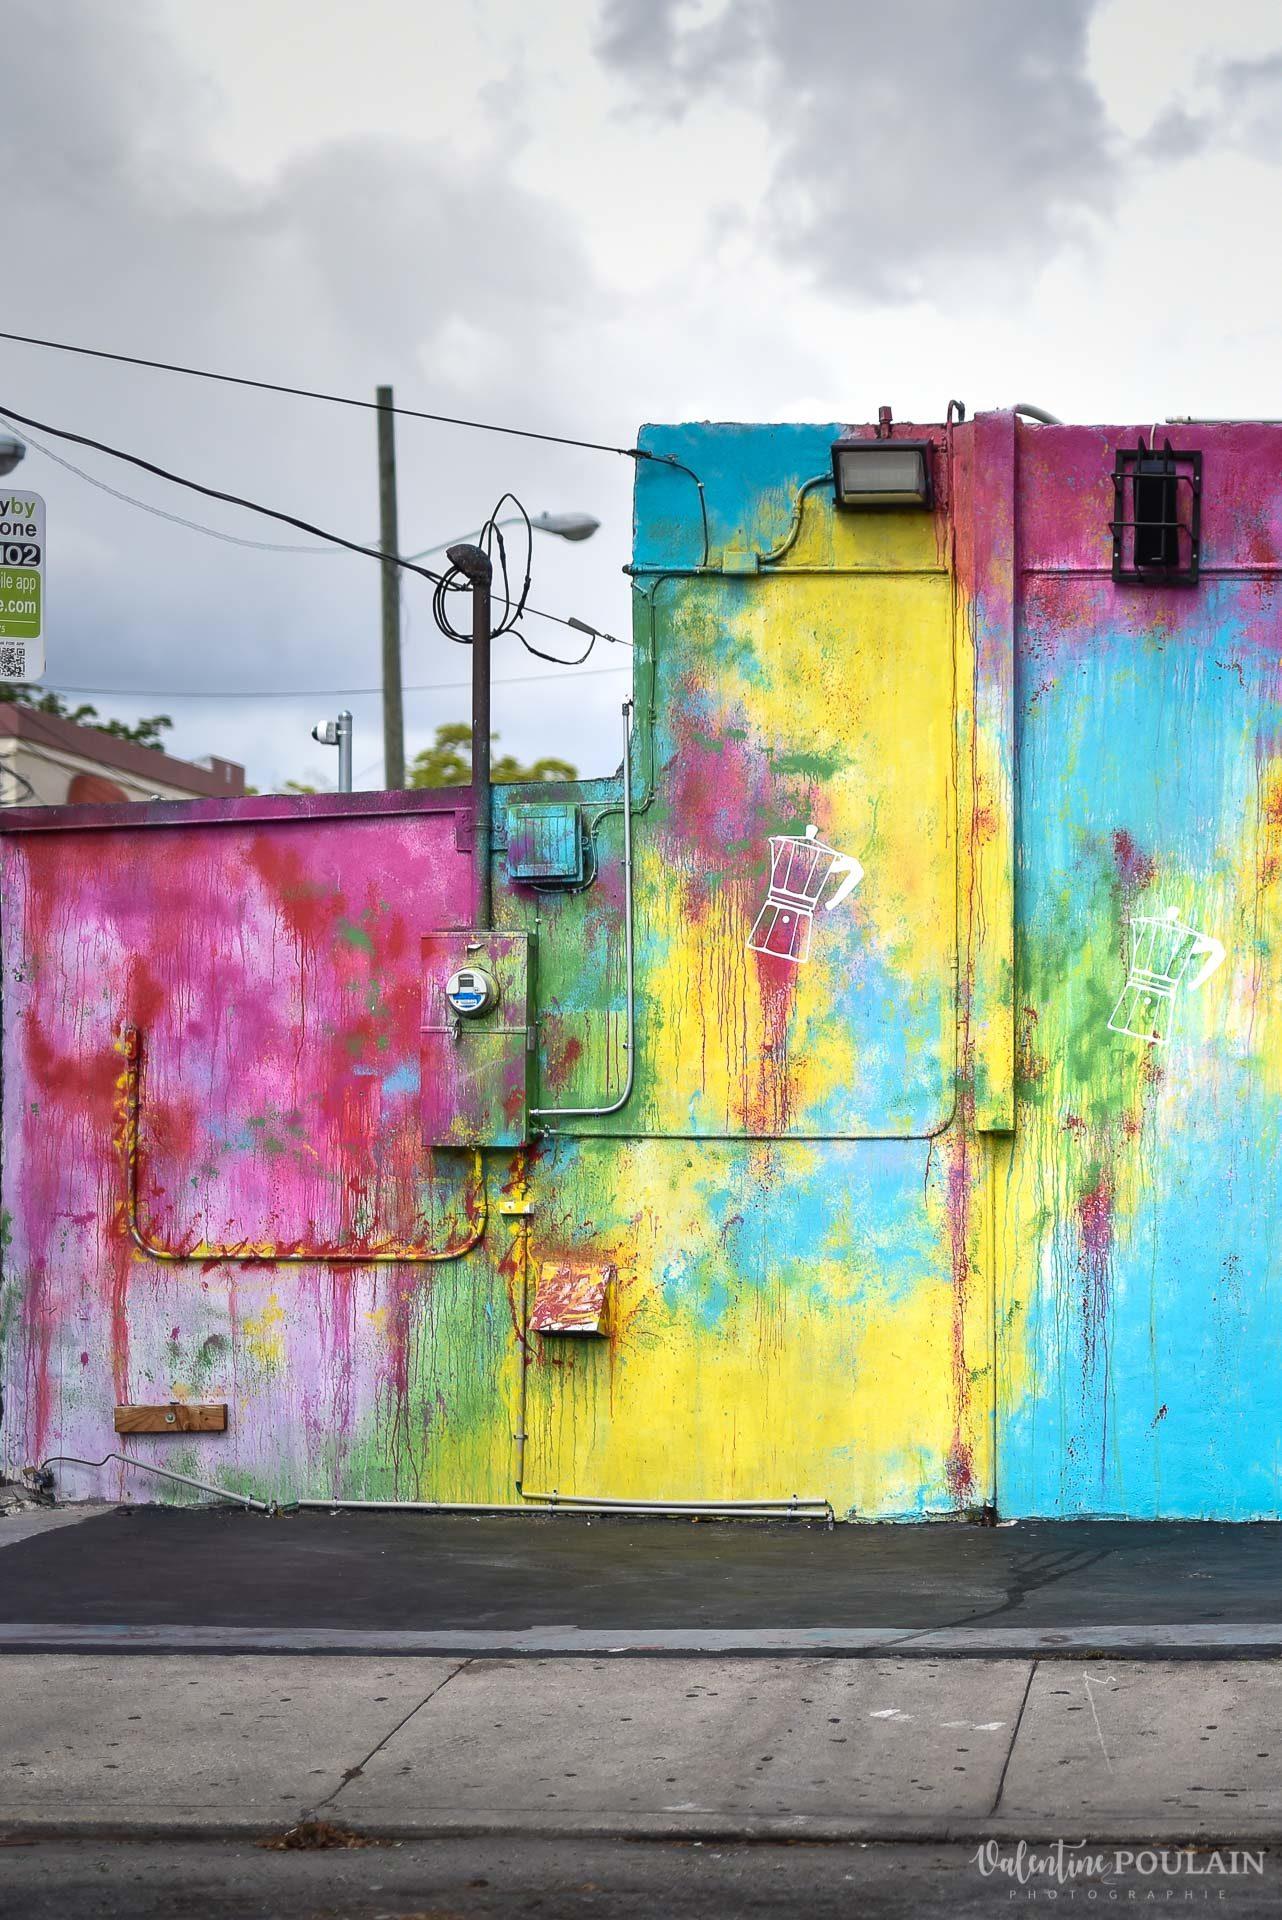 Couple Miami Wynwood - Valentine Poulain couleurs